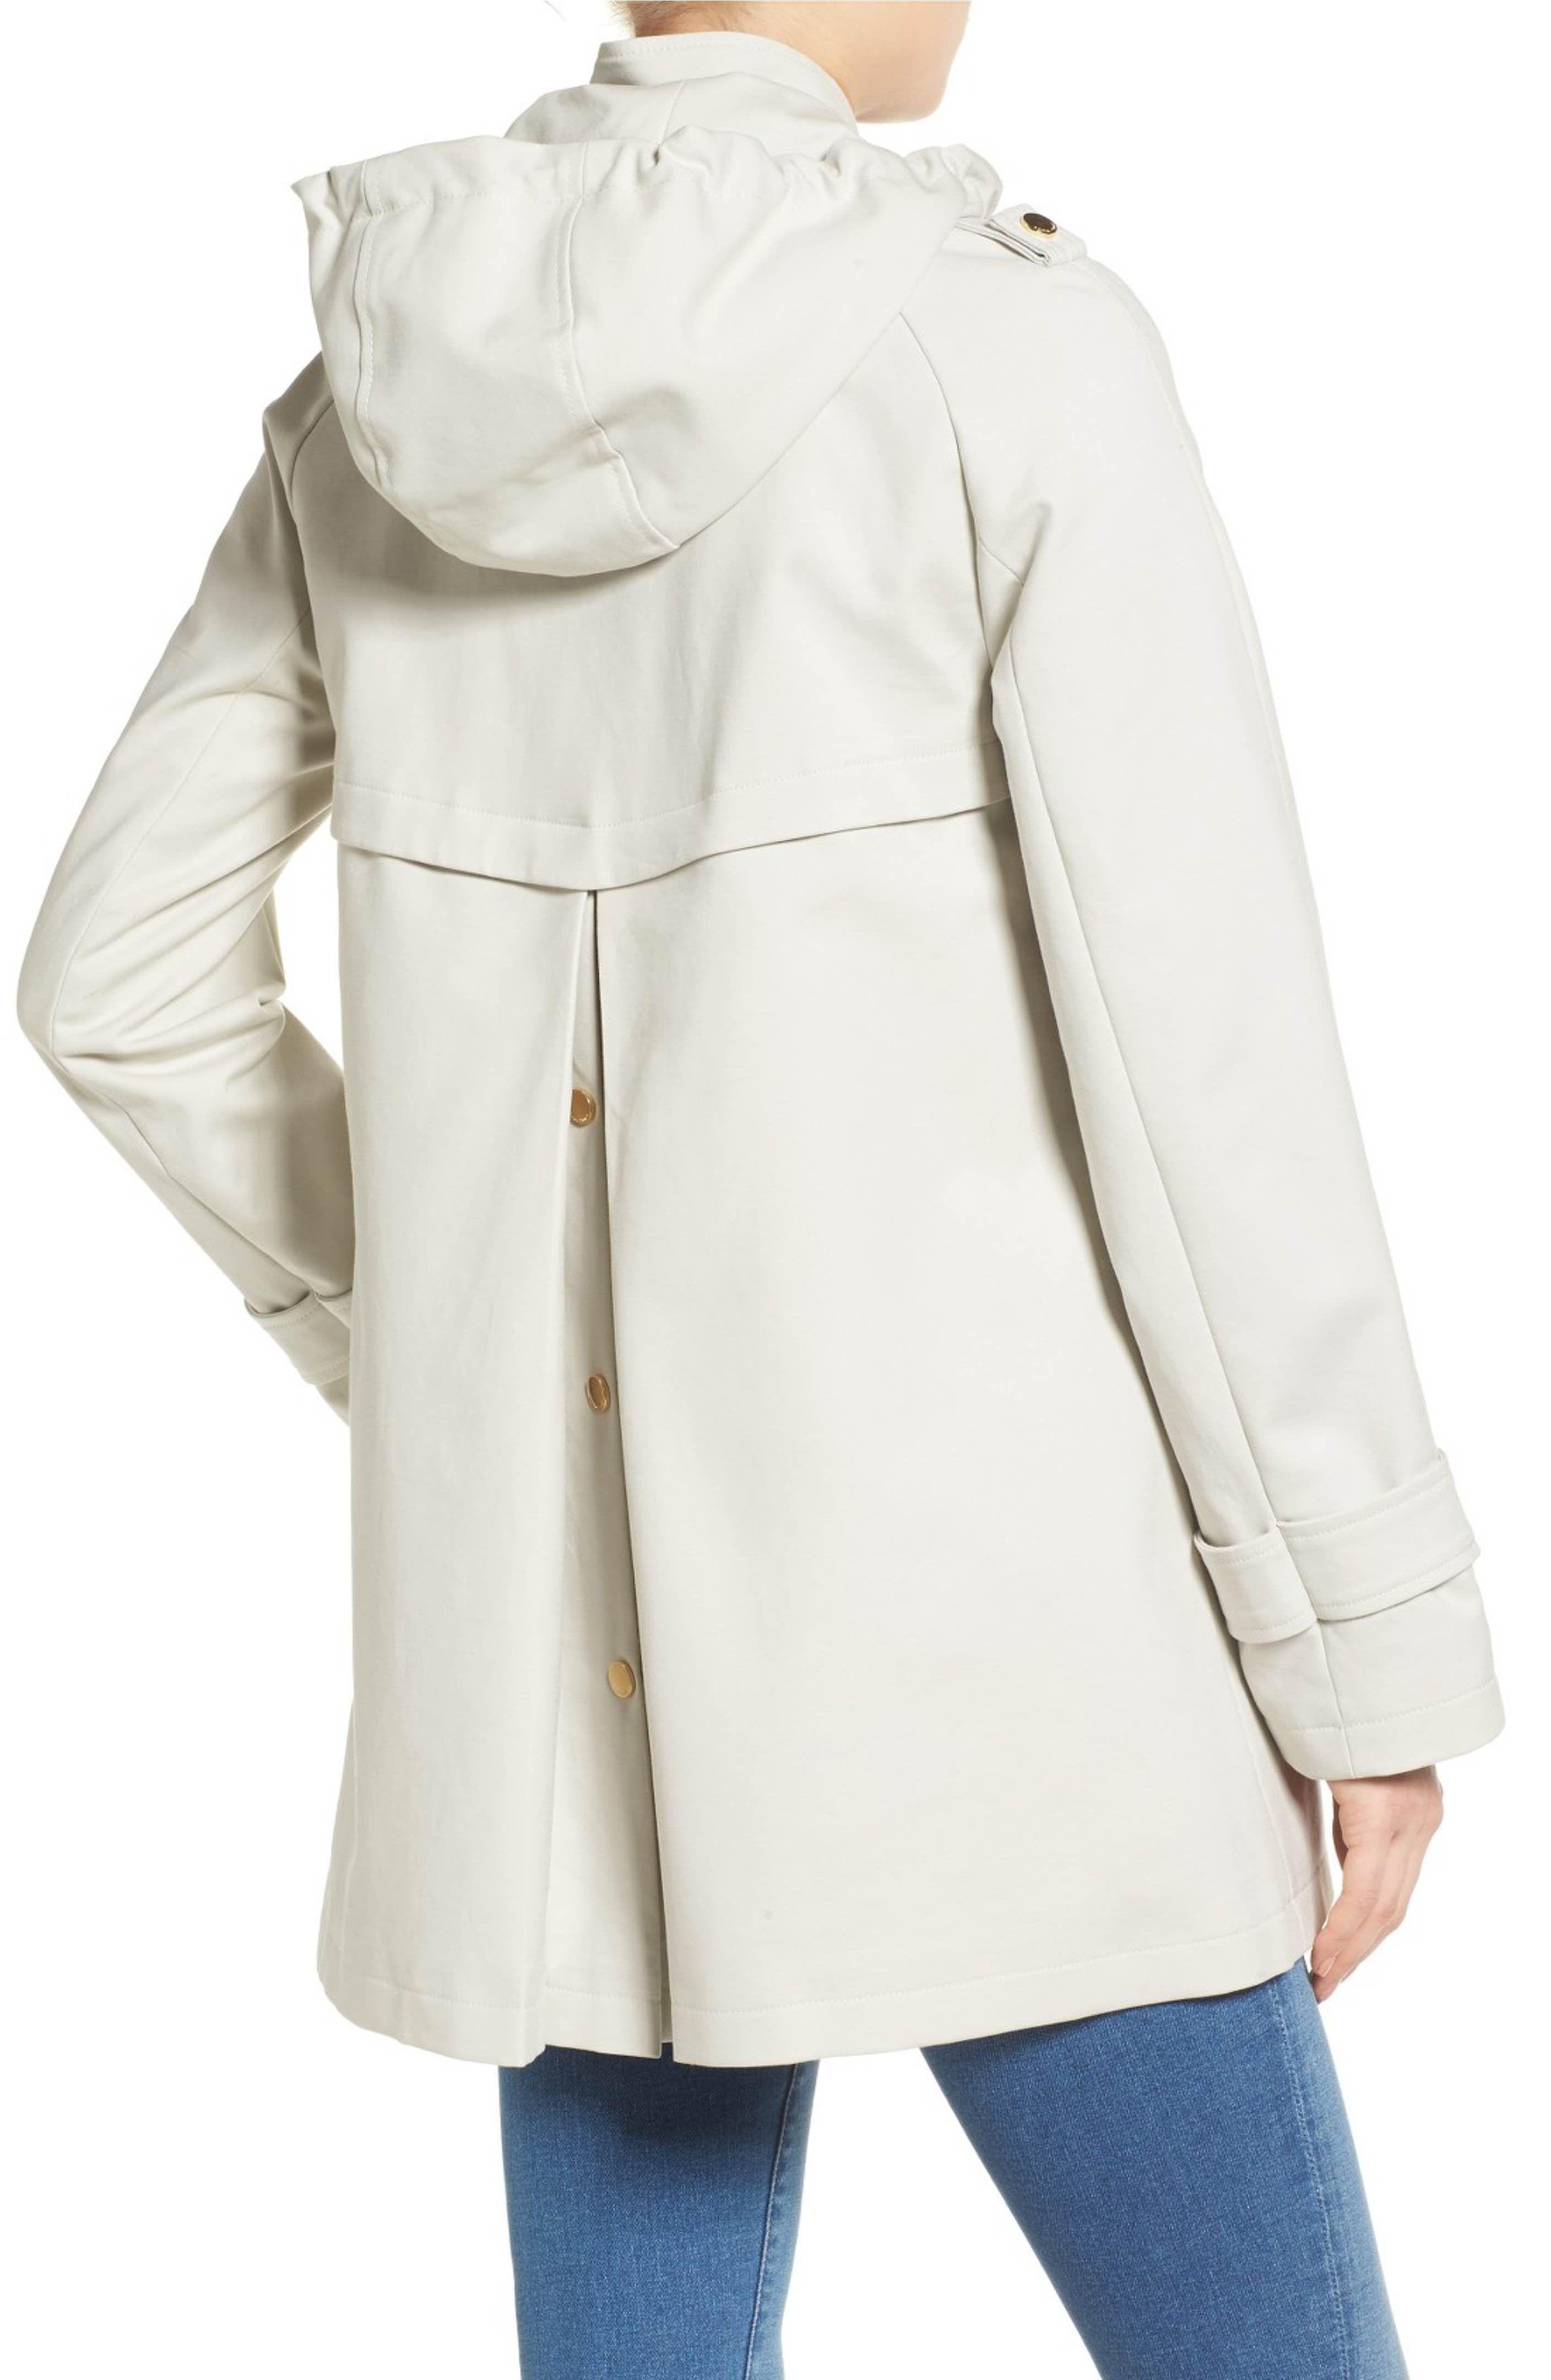 Hmarkt Mens Cotton Winter Hooded Thicken Faux Fur Collar Outwear Fleece Lined Drawstring Jackets